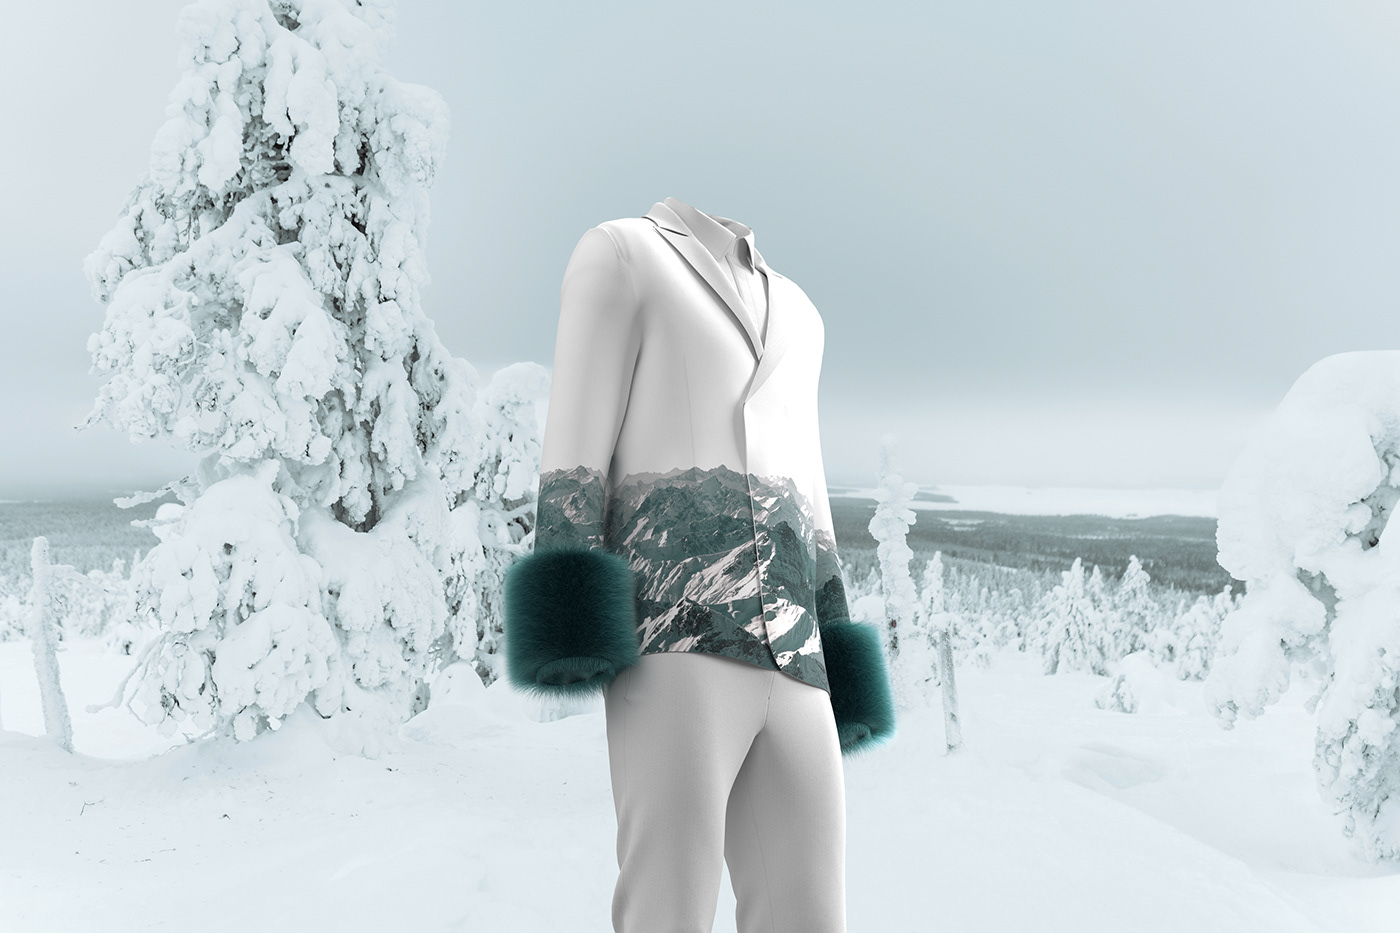 #Fashion3D #fashionvirtual #moda3D #modadigital #virtualfashion